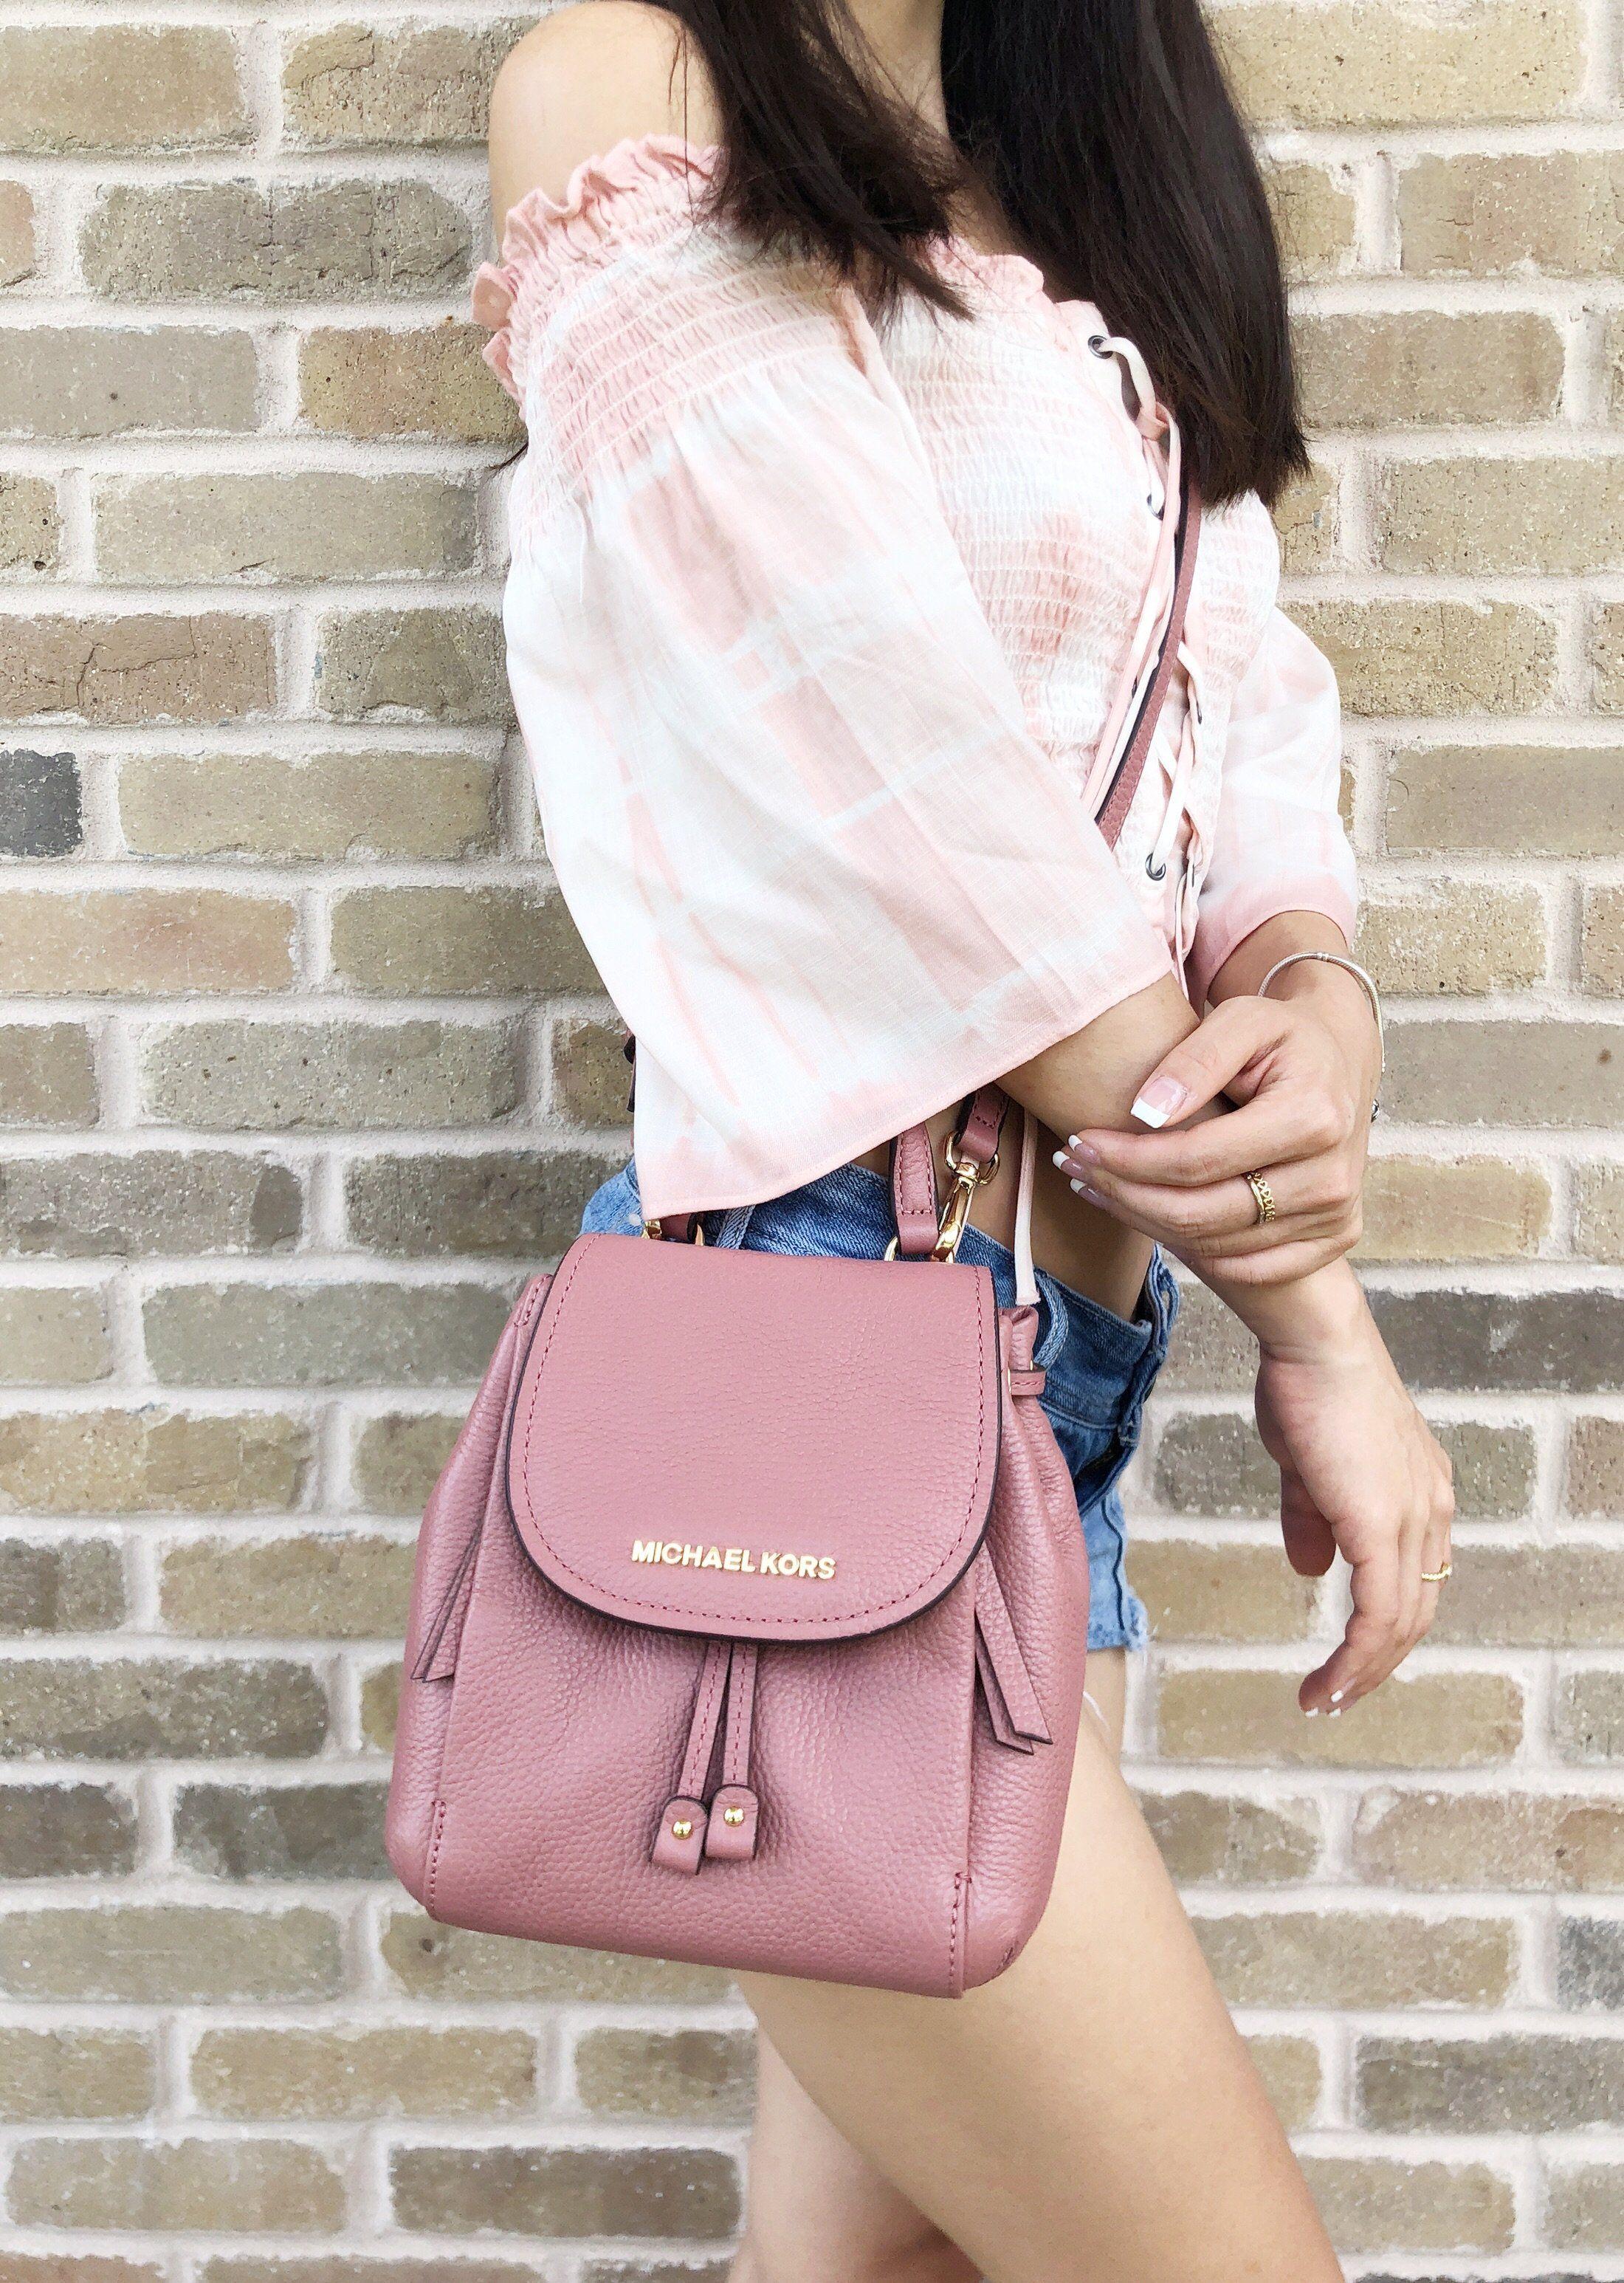 3d8168dddd8f ... get michael kors mini riley small crossbody rose pink backpack style  handbags gabysbags info for 2fbce